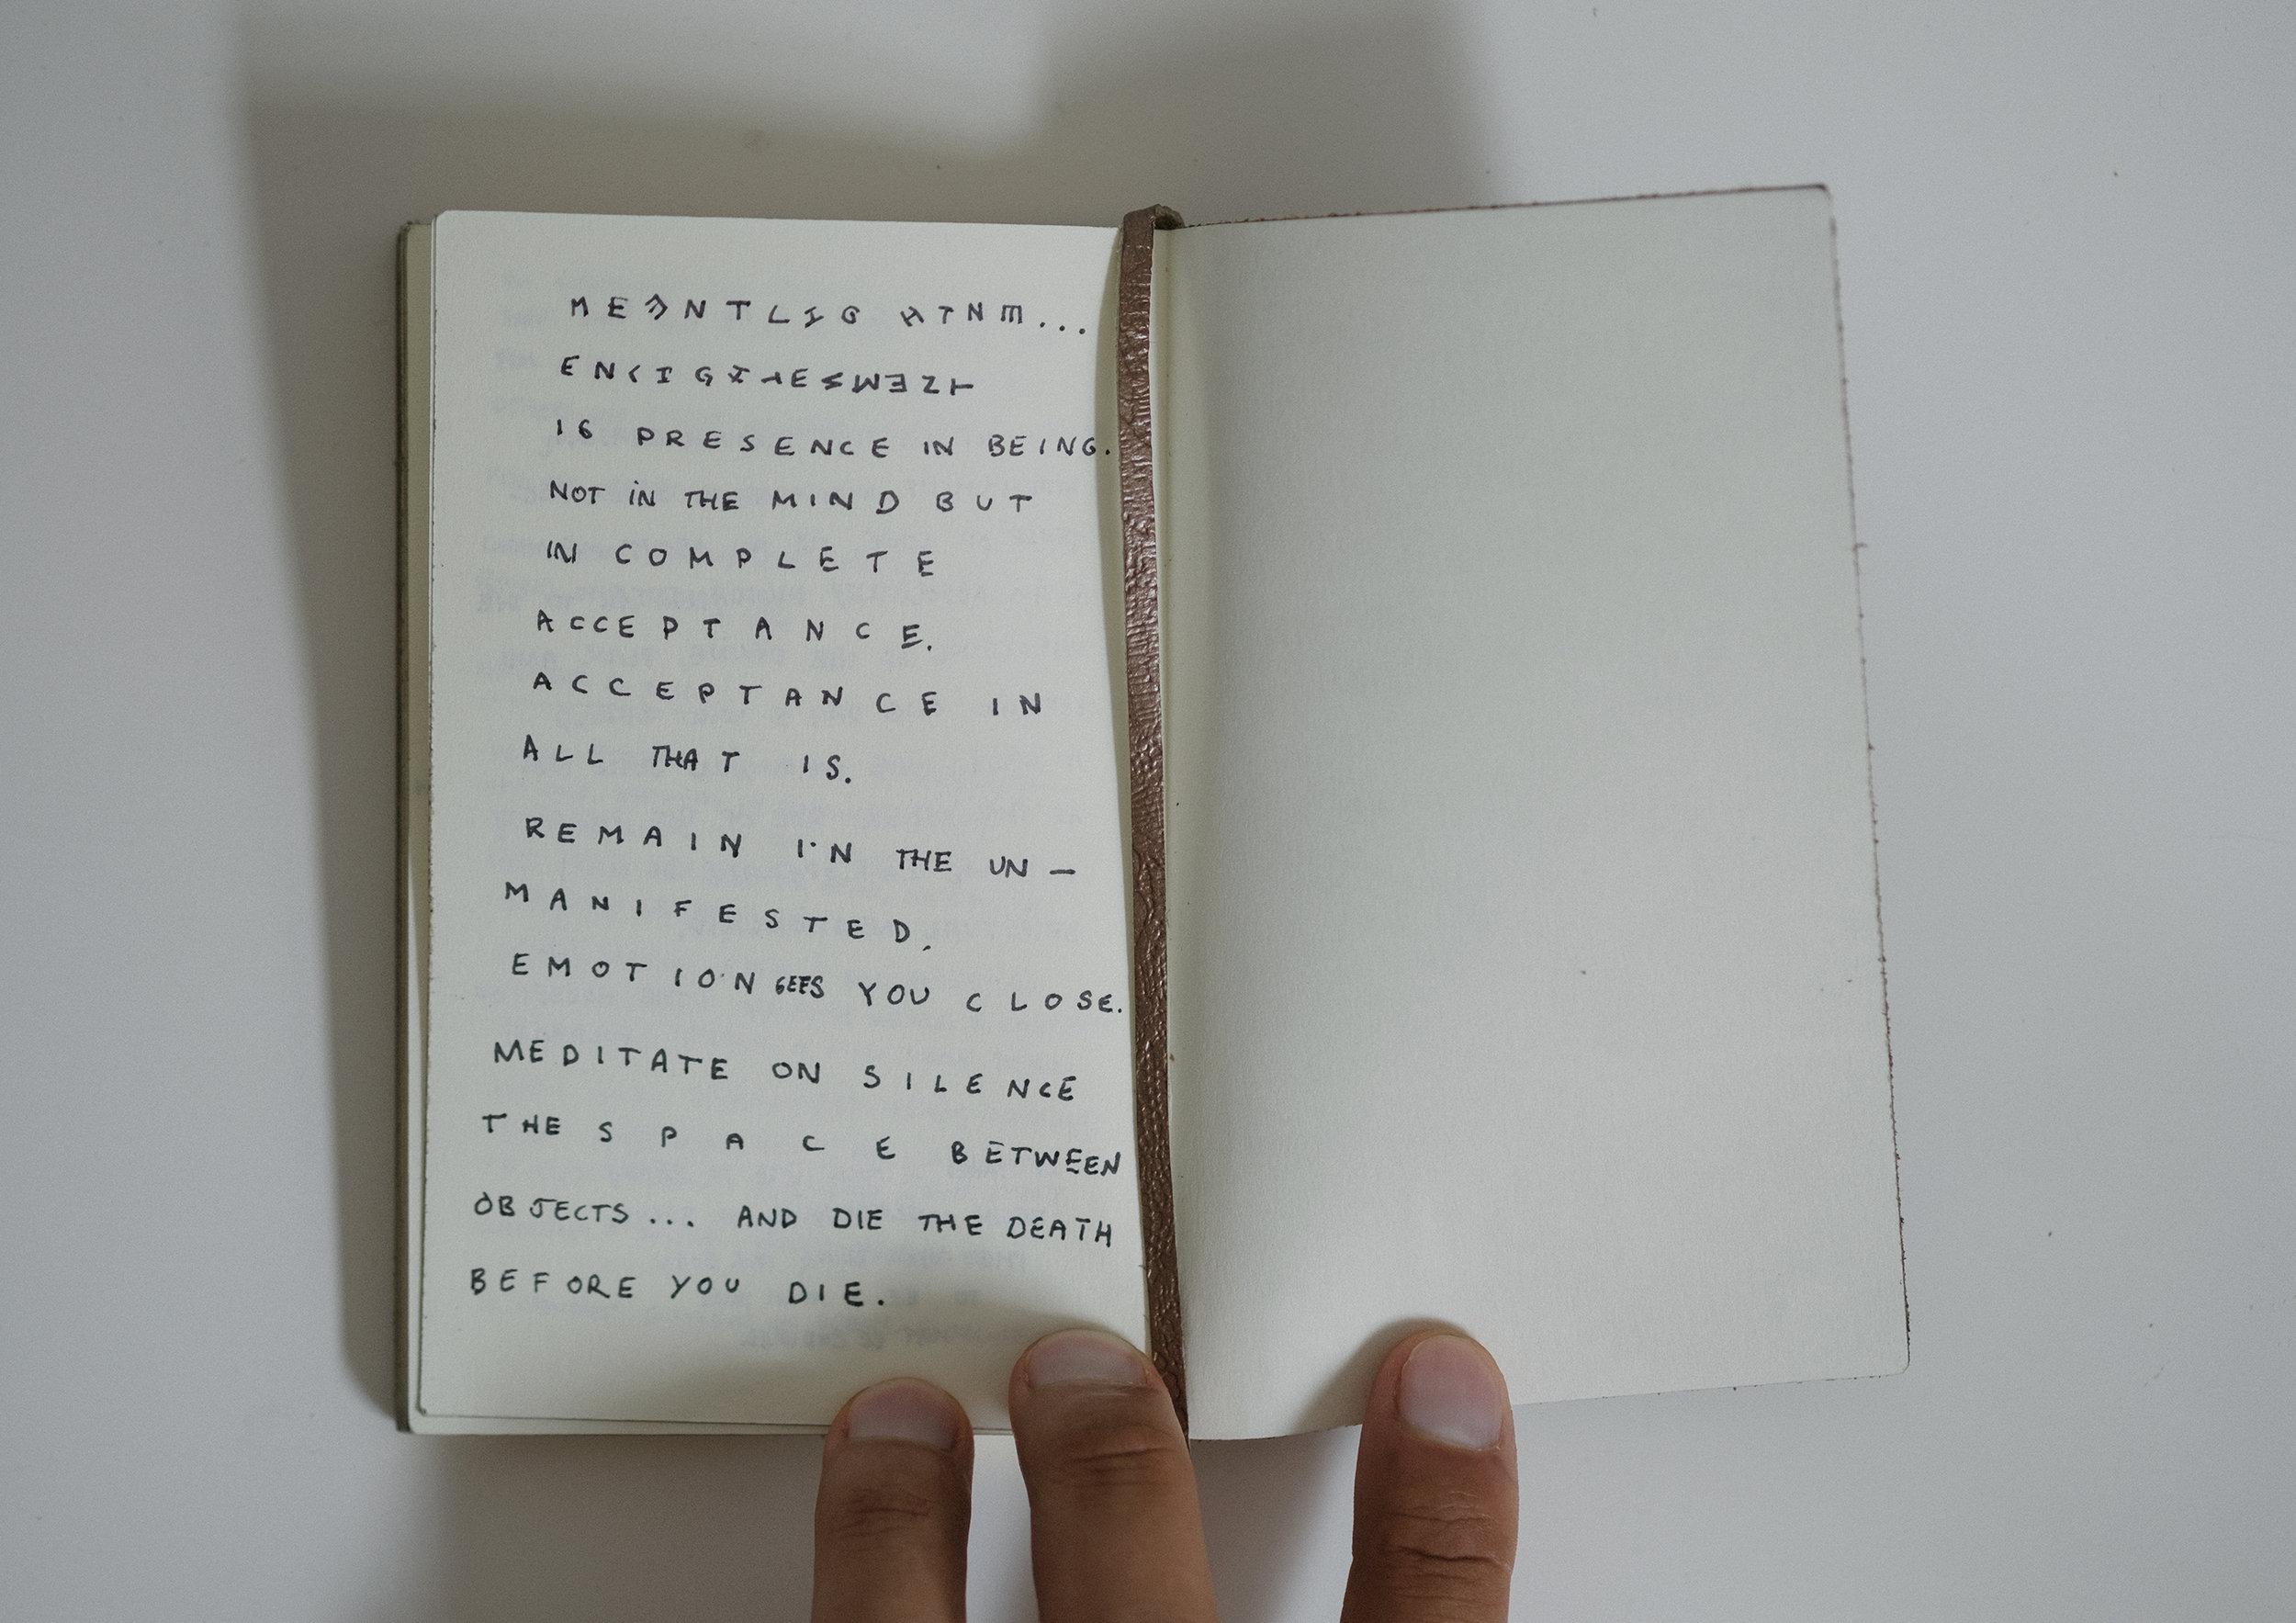 6-AARRTTBOOKS_PAGES-432.jpg